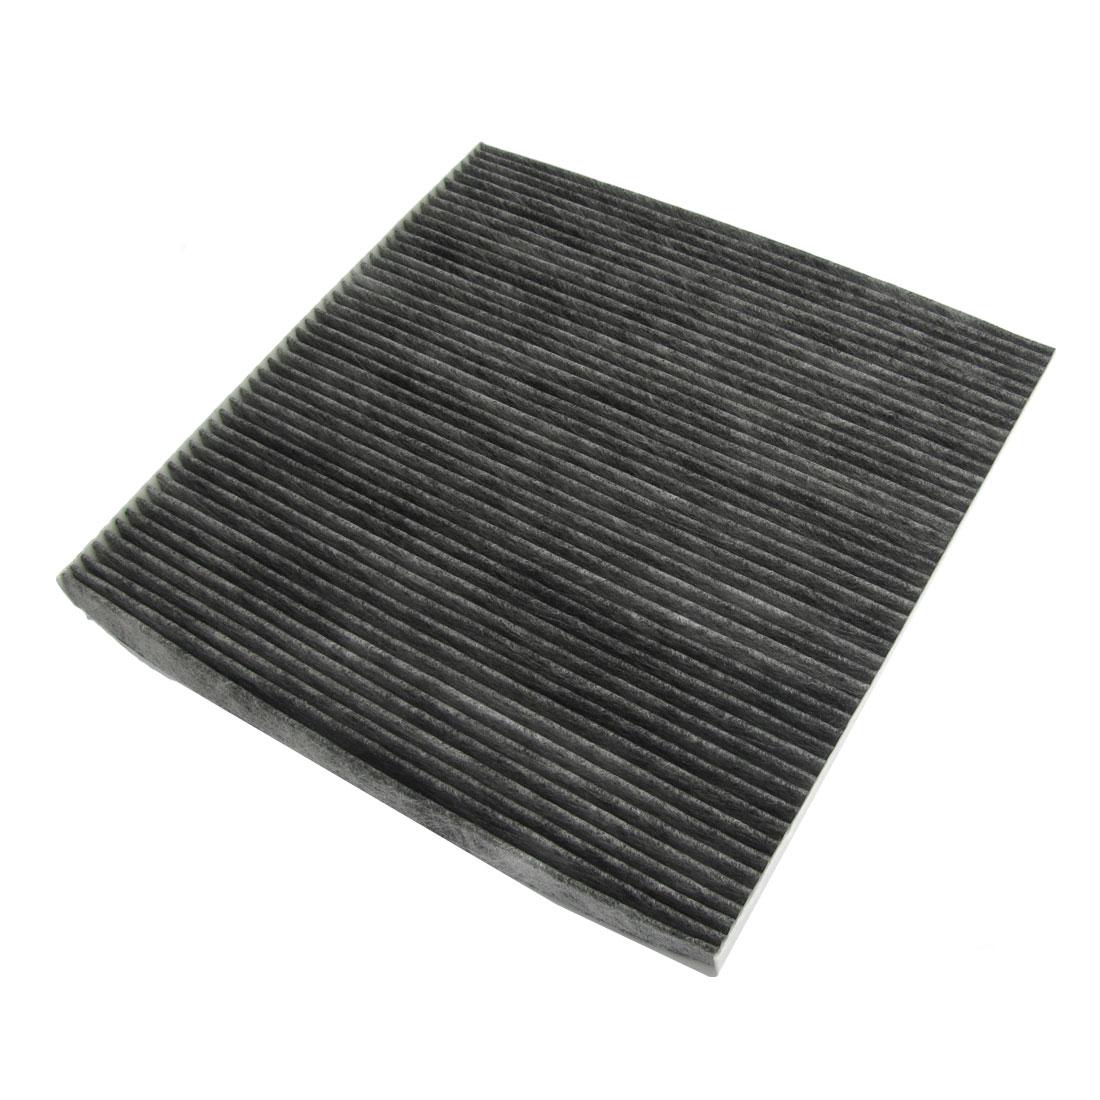 Black Active Carbon Fiber A/C Cabin Air Filter for Nissan Teana Cedric